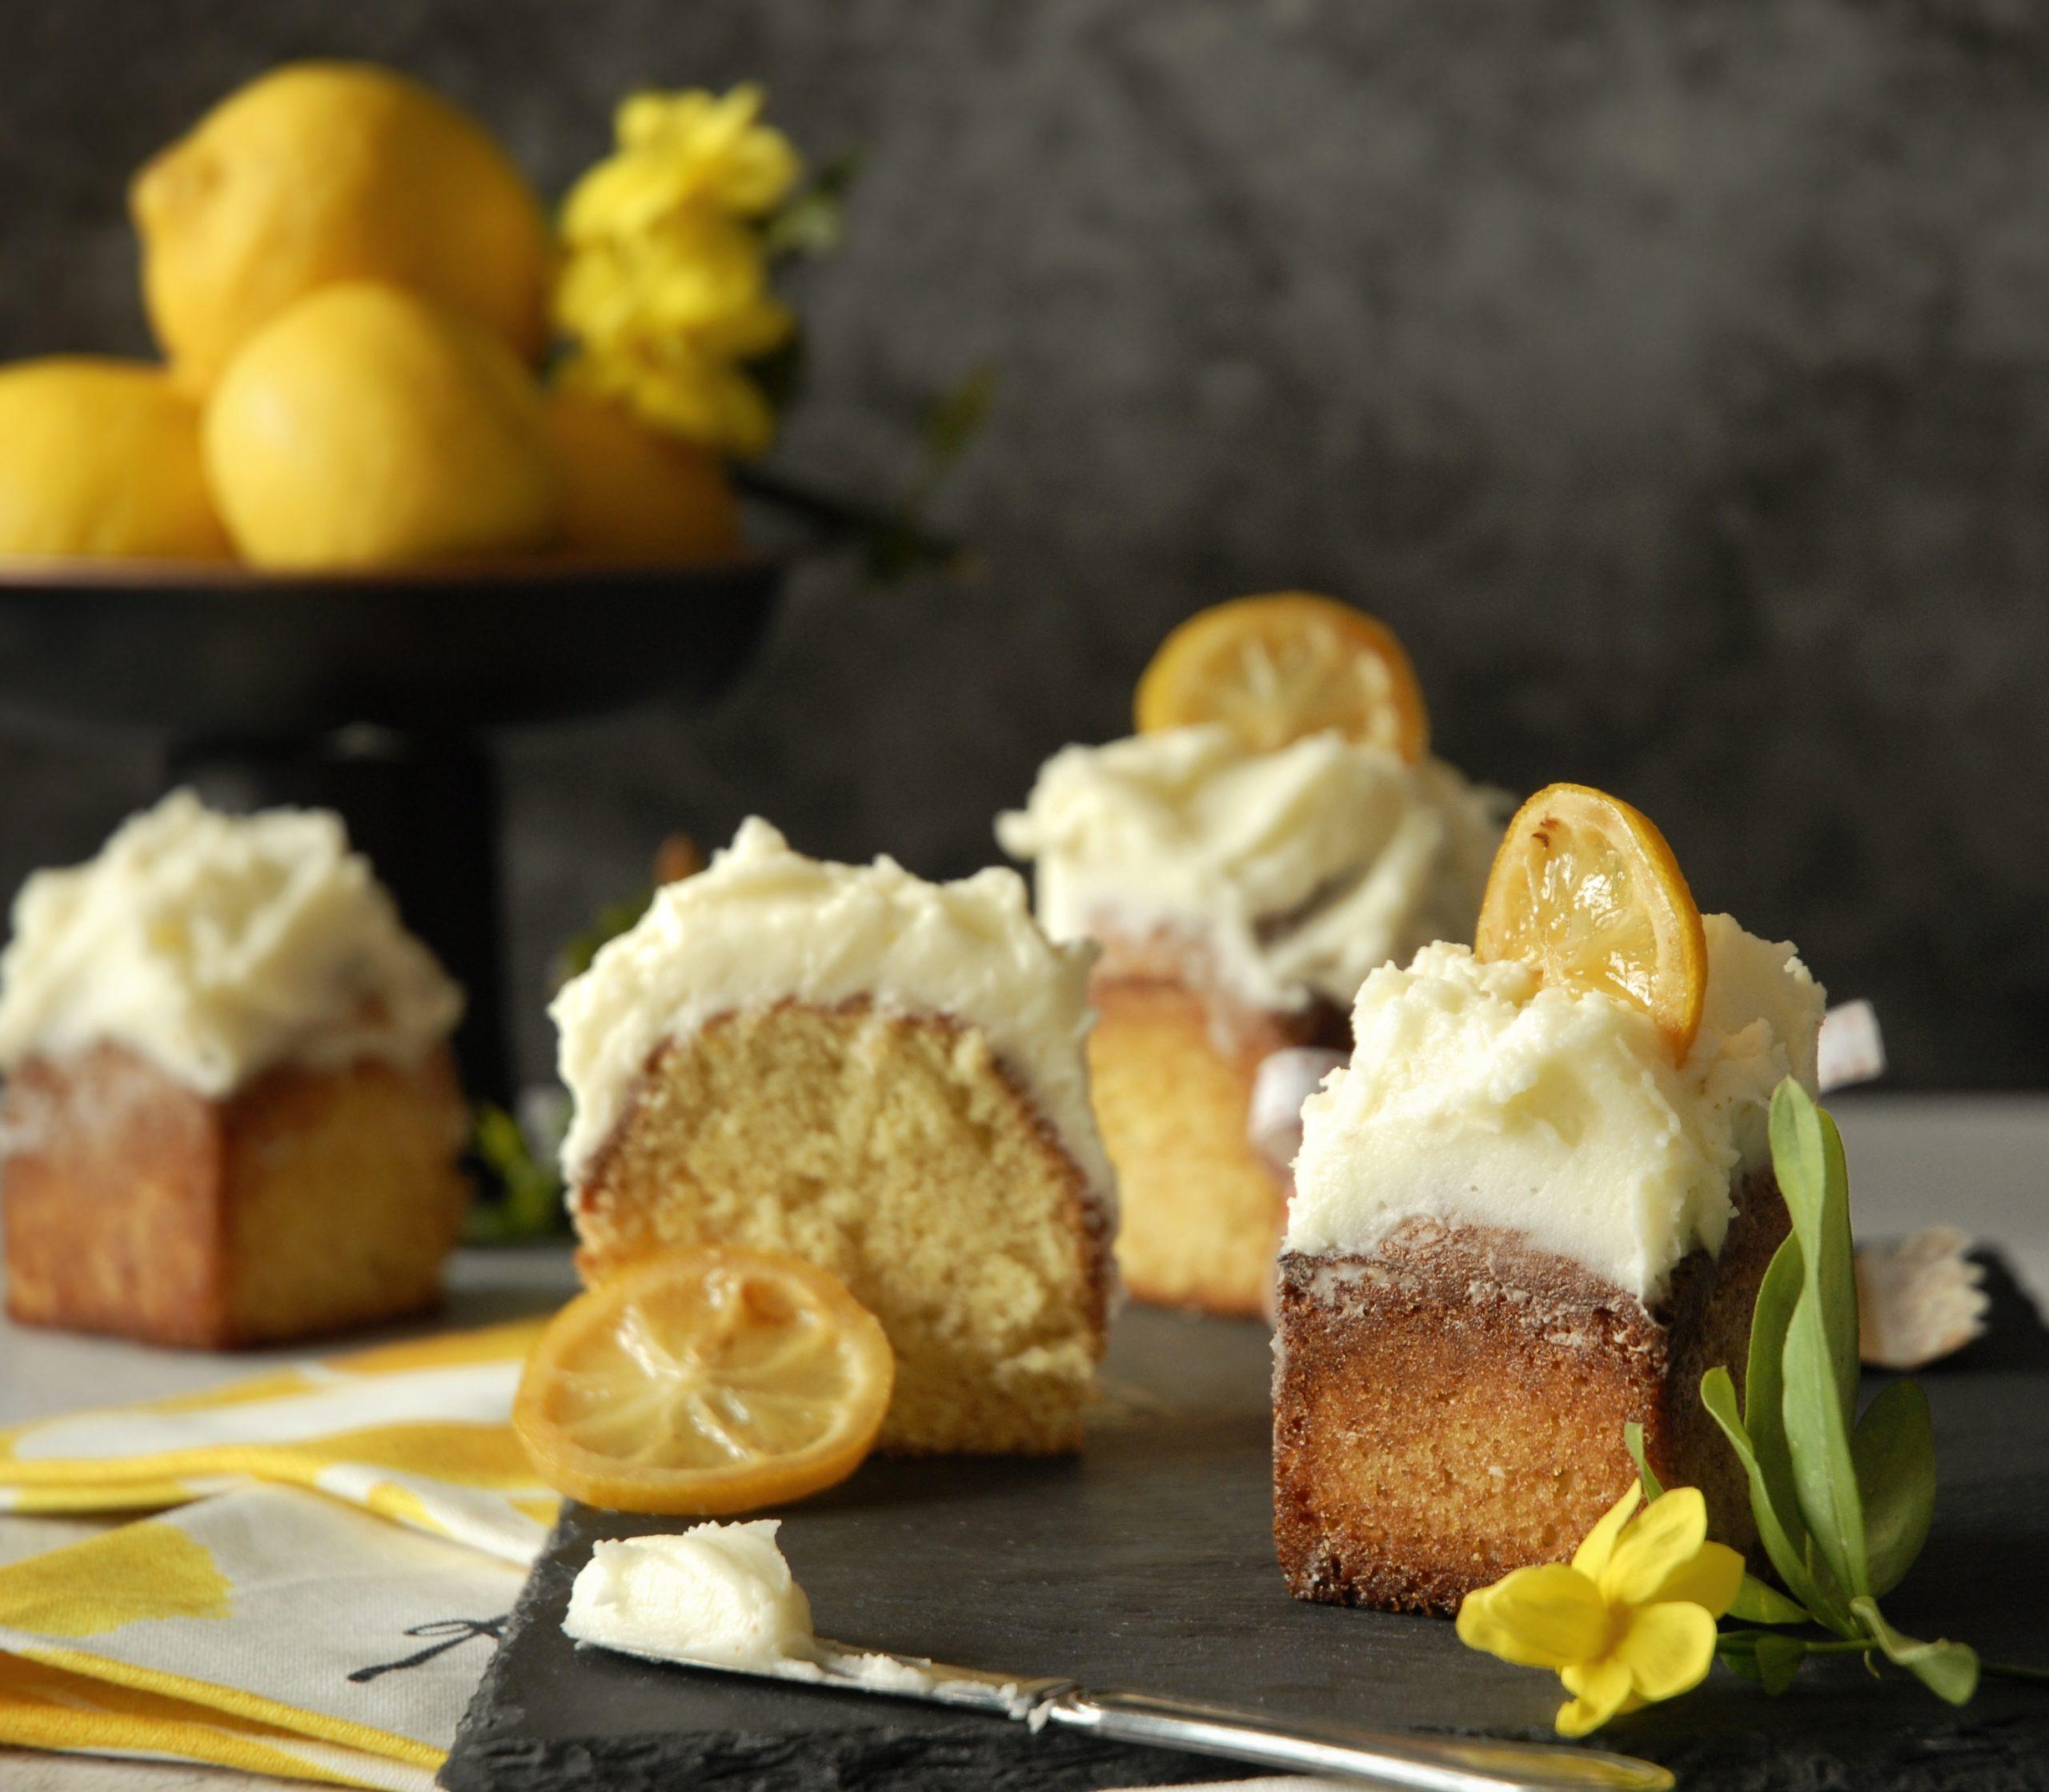 Cake al limone e olio d'oliva